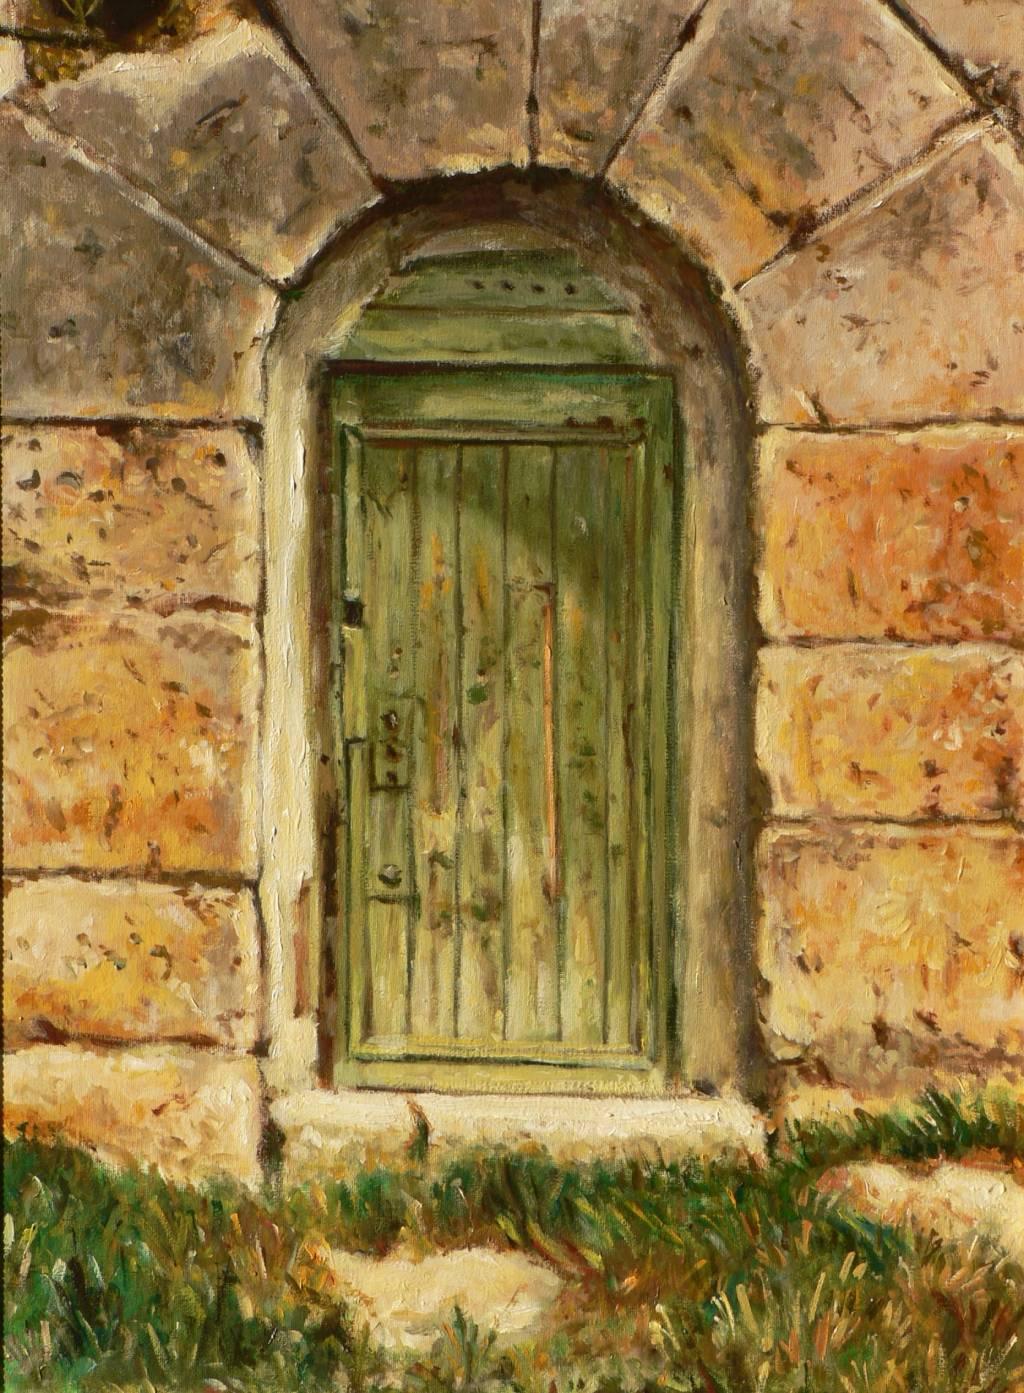 Puerta vieja carlos javier mar n fuentes for Puerta 4 del jockey